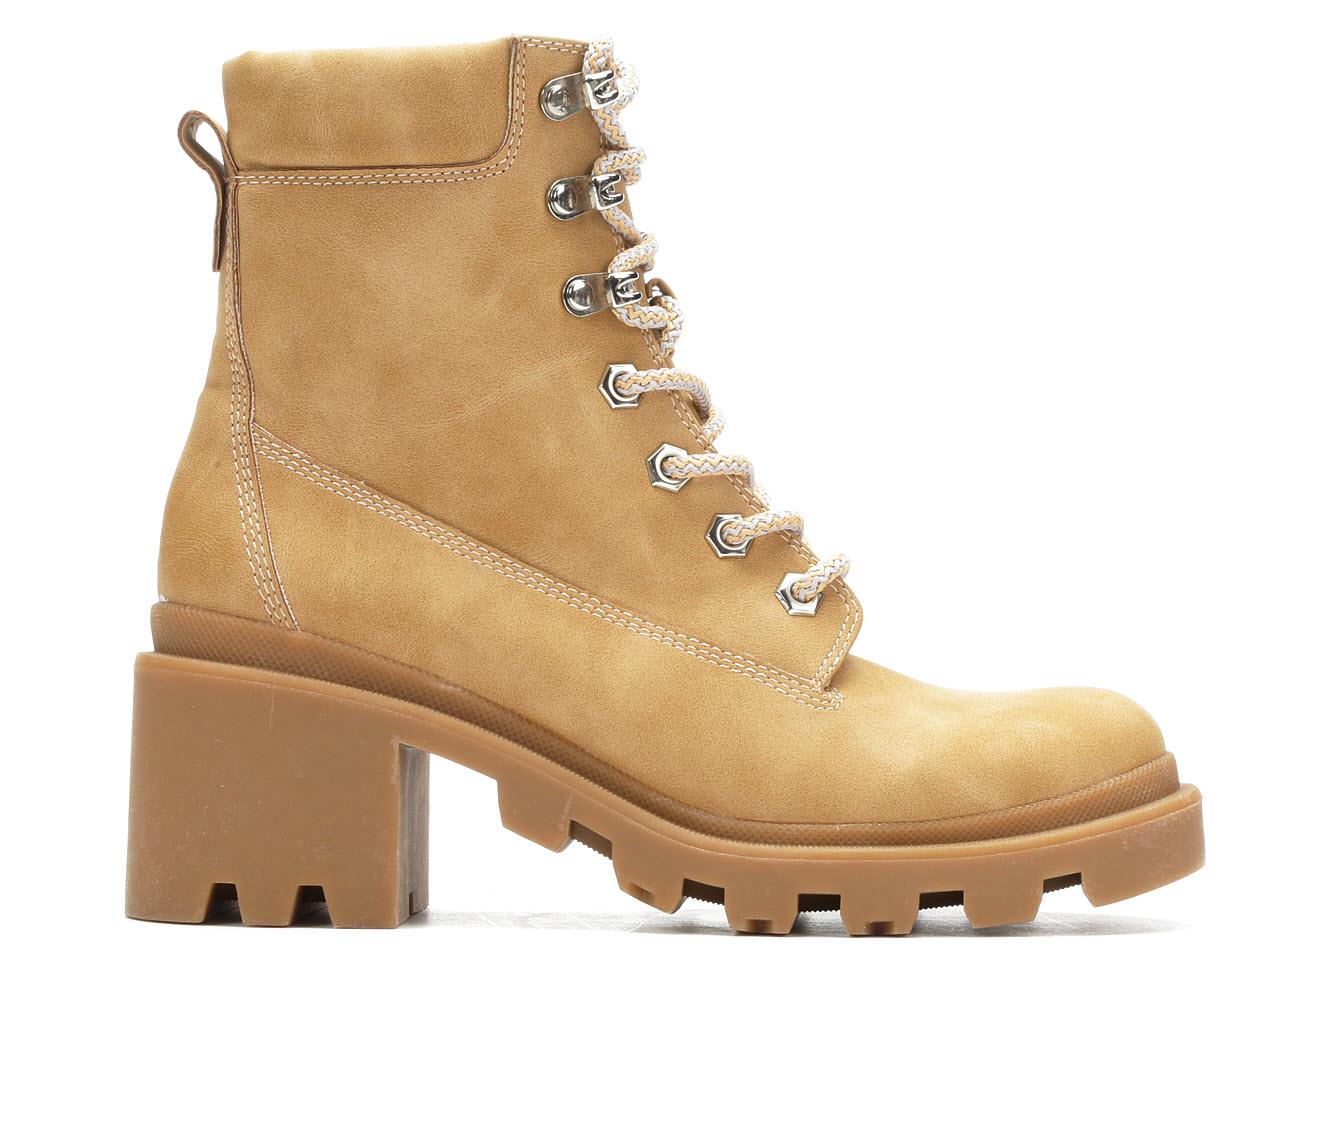 Madden Girl Dillian Women's Boot (Beige Faux Leather)